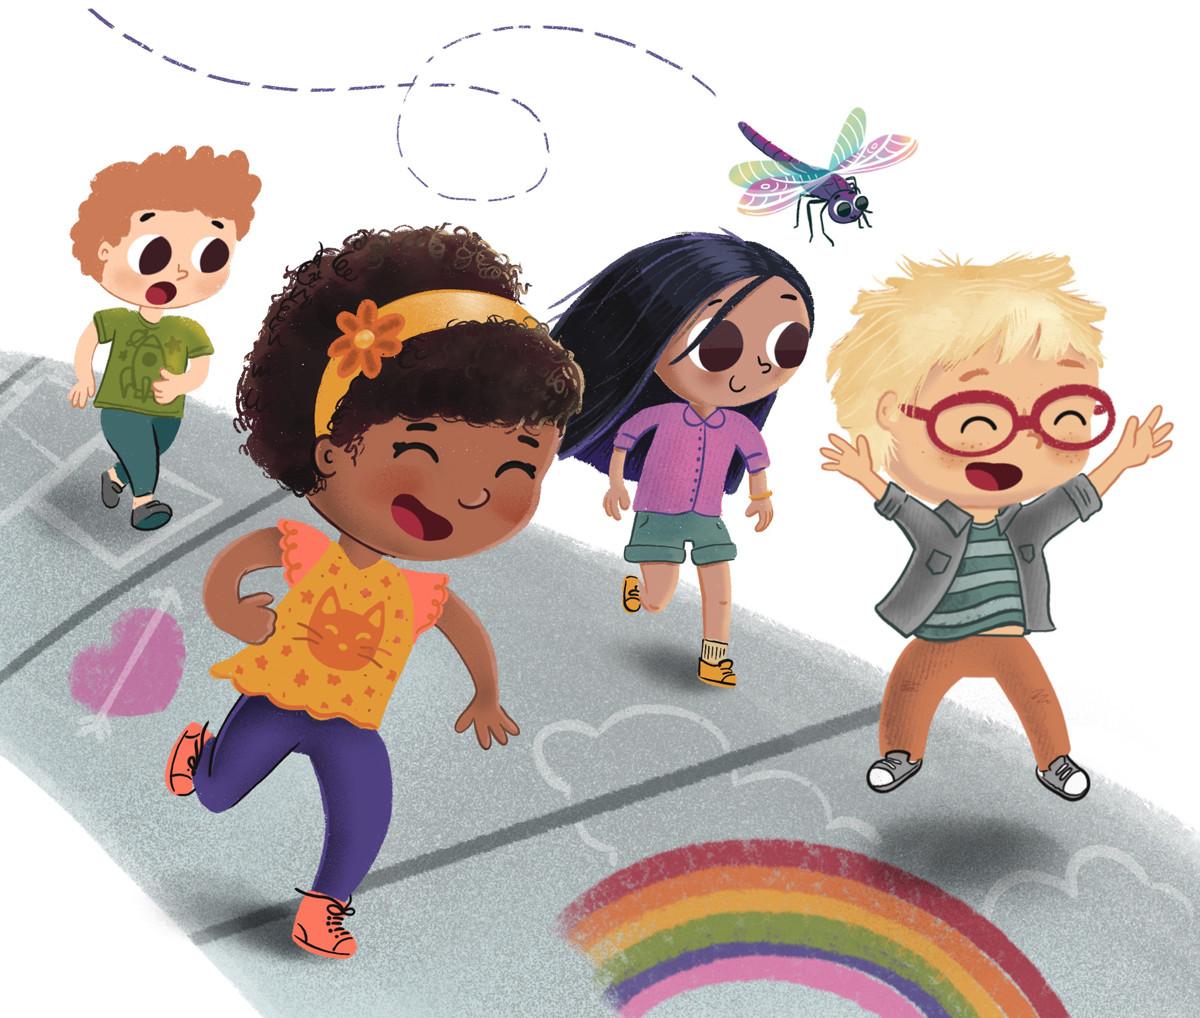 Characters running alongside dragonfly on sidewalk